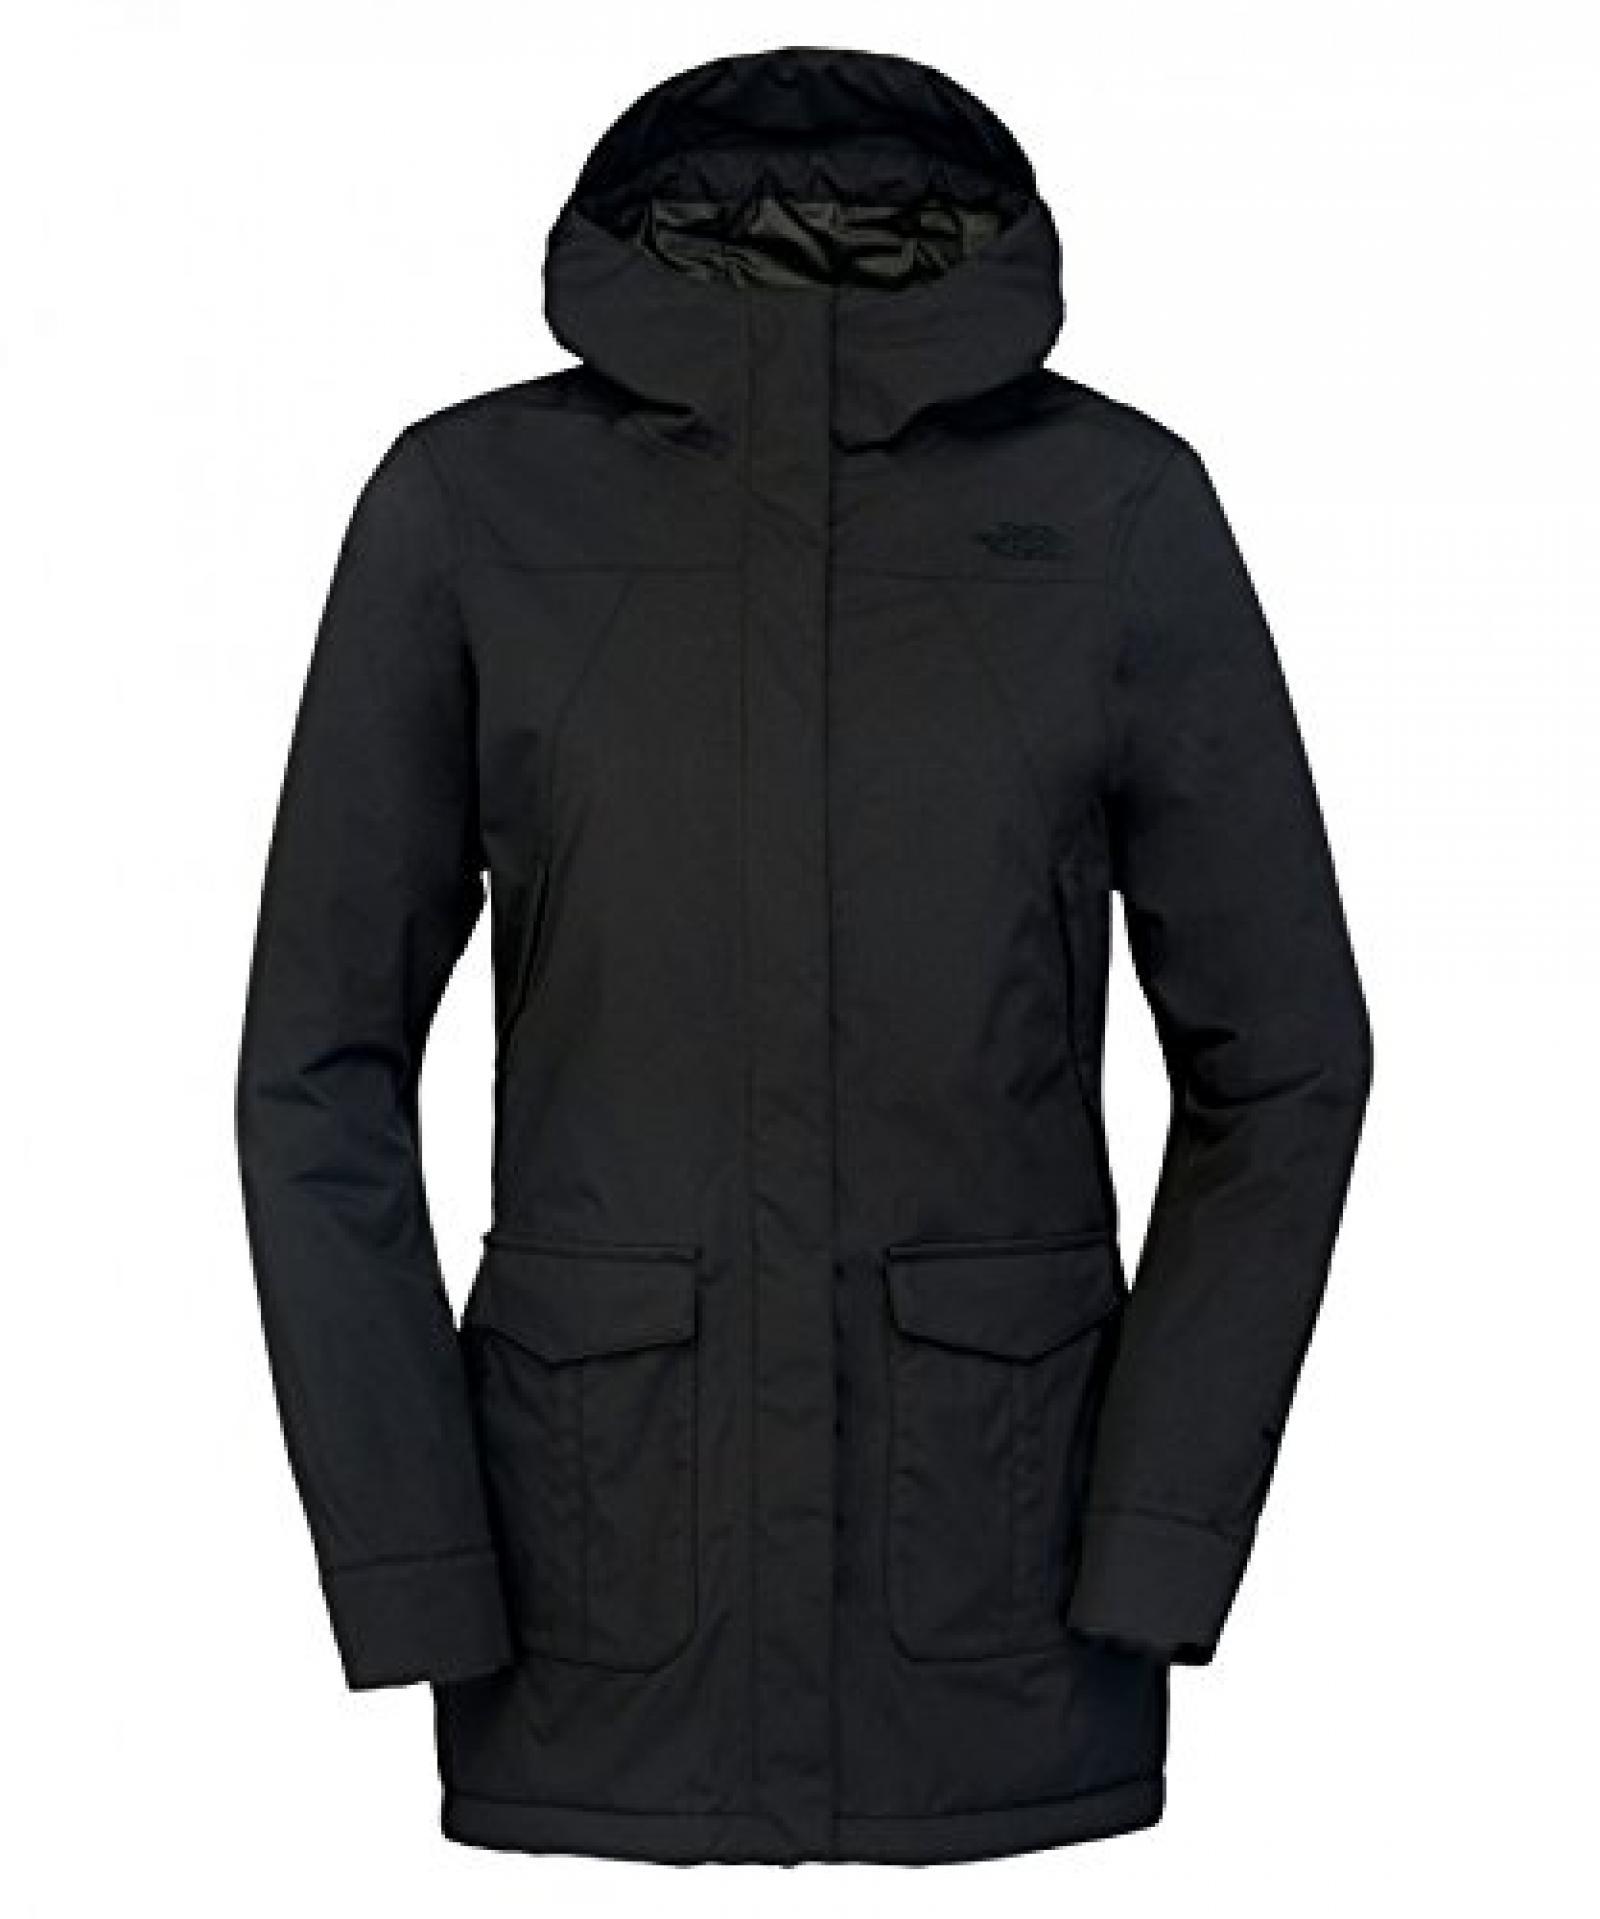 The North Face NSE Jacket Women - Winterjacke